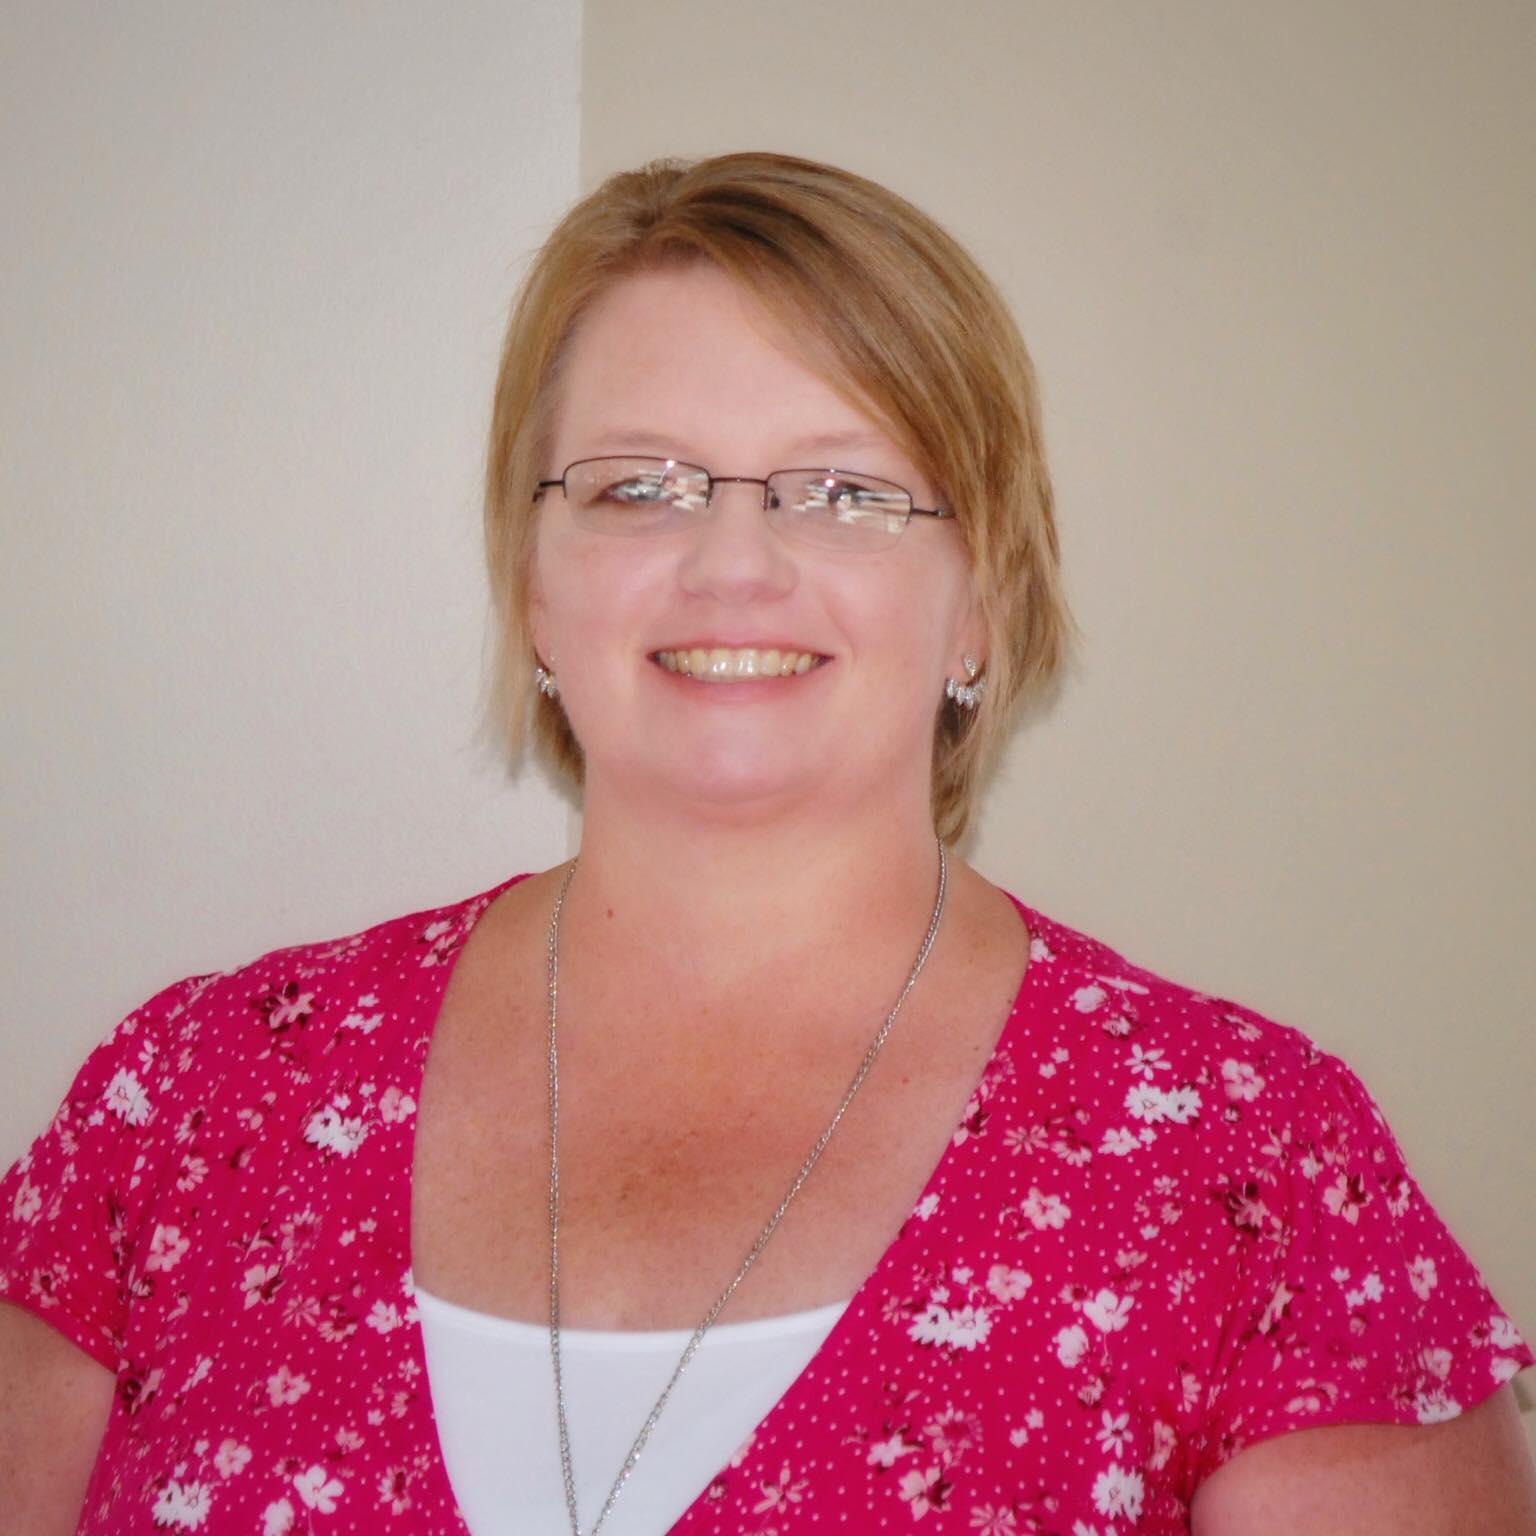 Kelley Gaines - Agent / kelleyg@d2travel.com